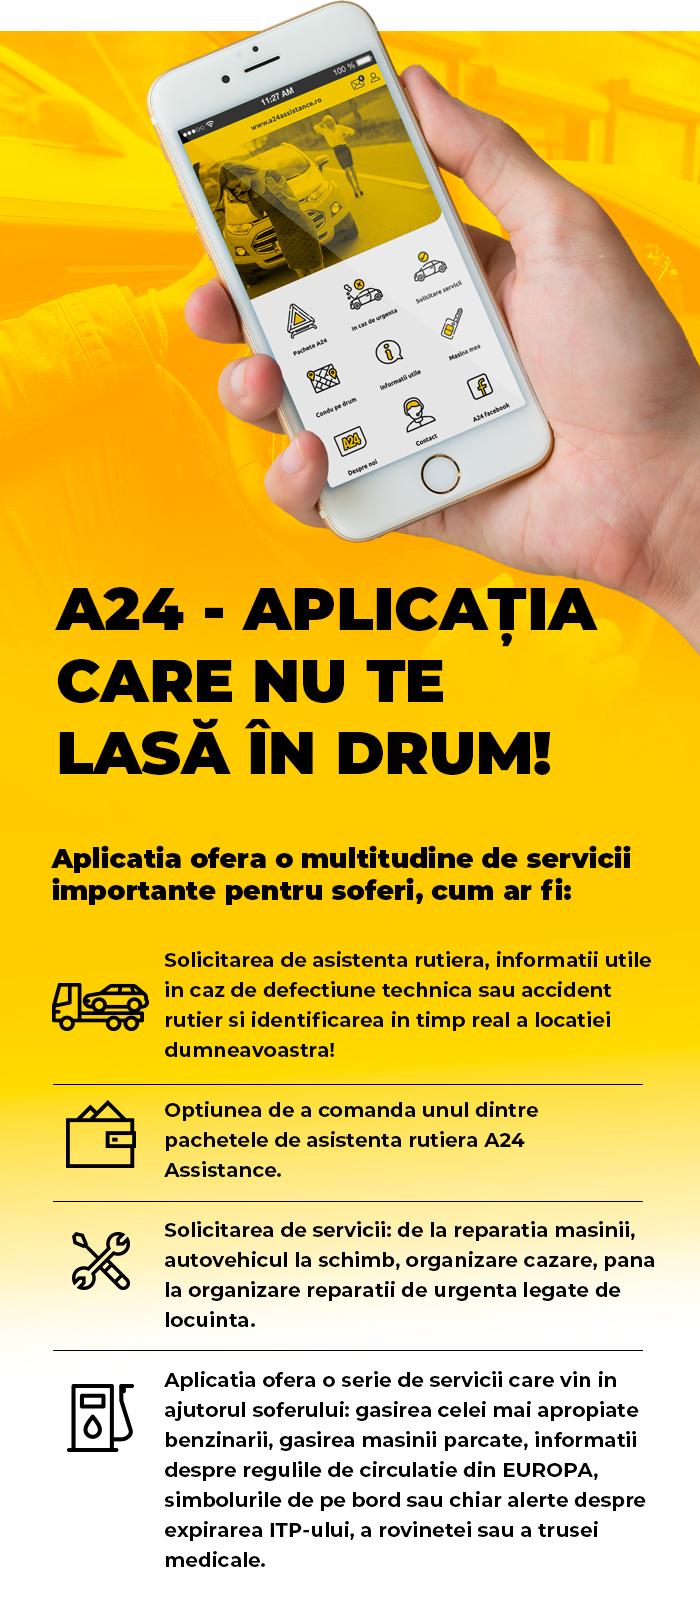 A24Assistance - Asistenta rutiera - APLICATIA A24